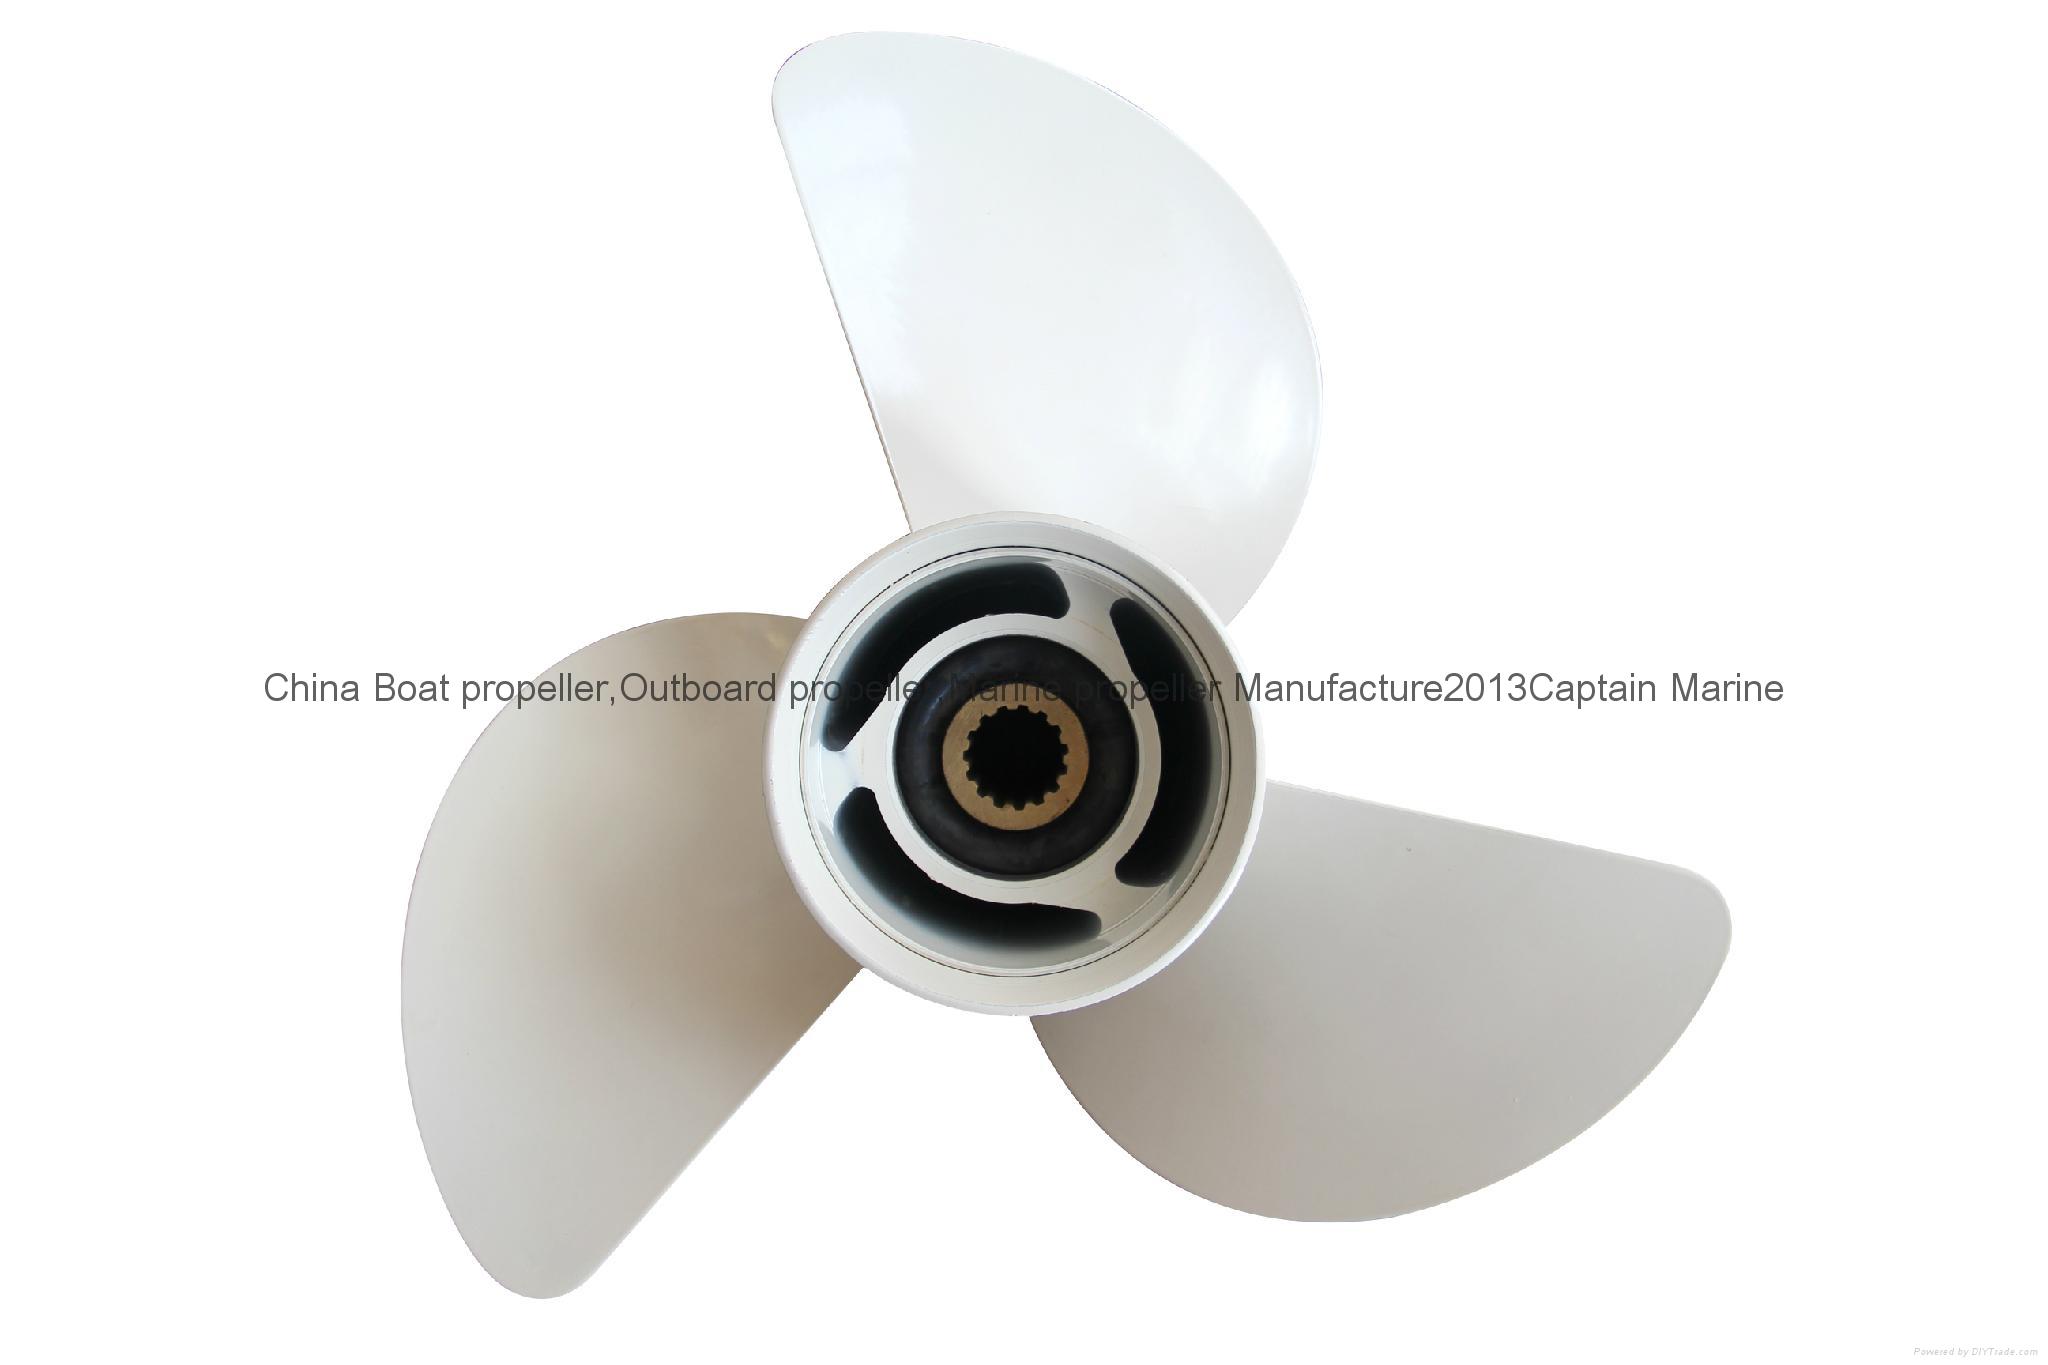 3 Blades Aluminum Alloy propeller for YAMAHA Motor 85HP-115HP  13 1/4 x 17 5